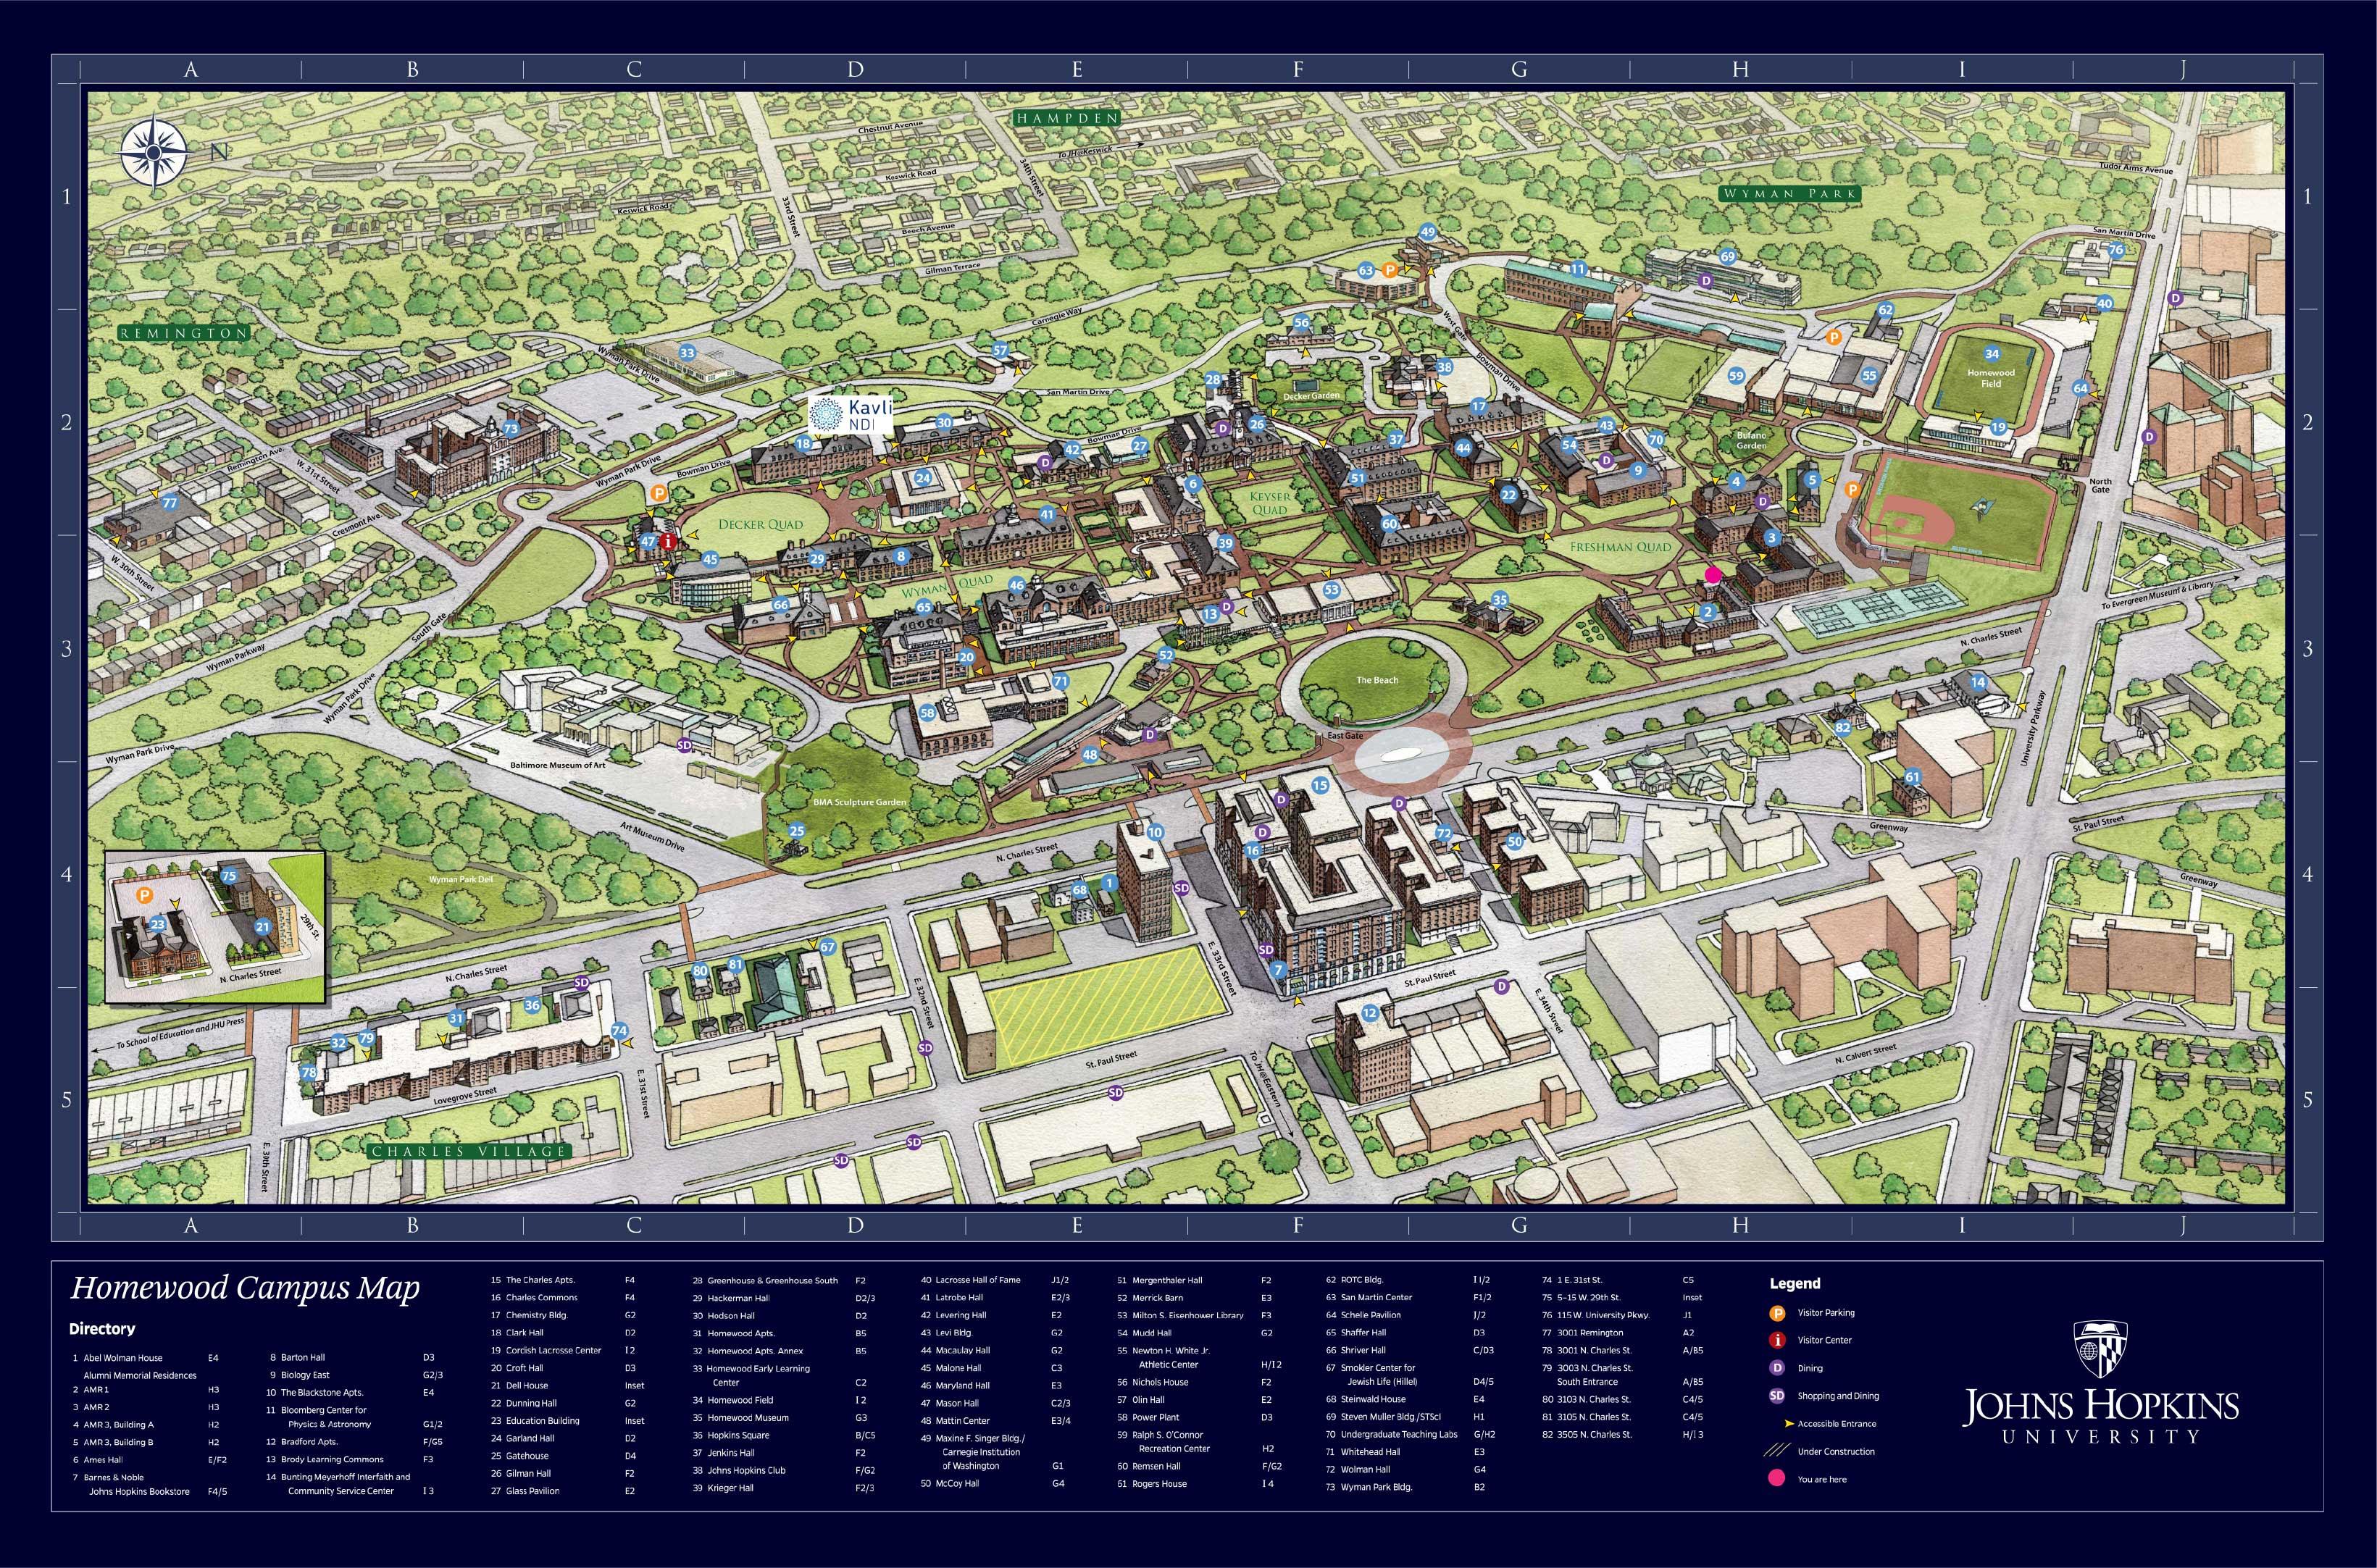 Johns Hopkins Homewood Campus Map Jhu Campus Map | States Maps